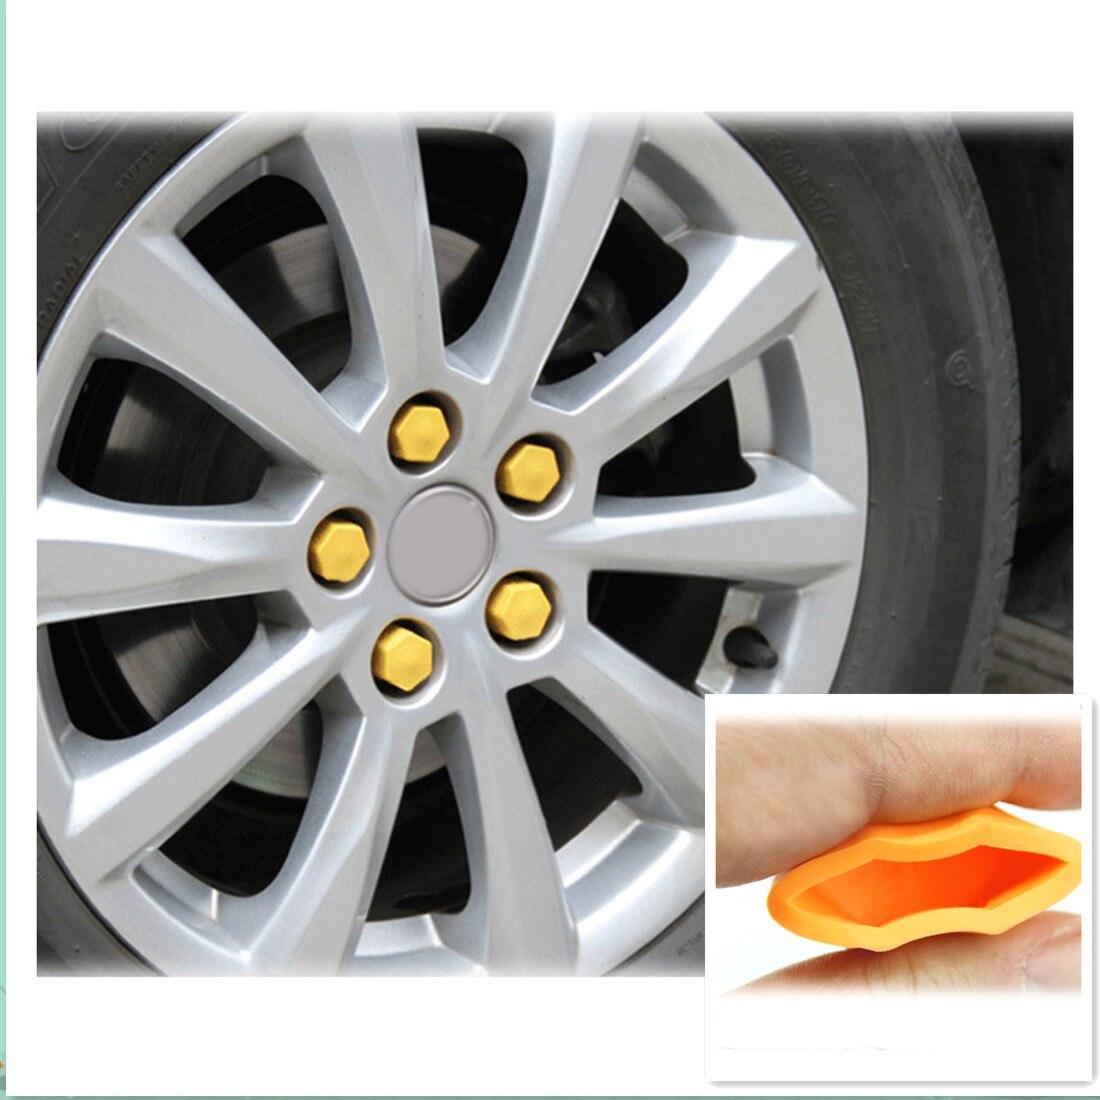 Mini Car Styling 20pcs/set Silica Gel Wheel Nuts Covers Protective Caps Hub Screw Protector For Mitsubishi Outlander Pajero